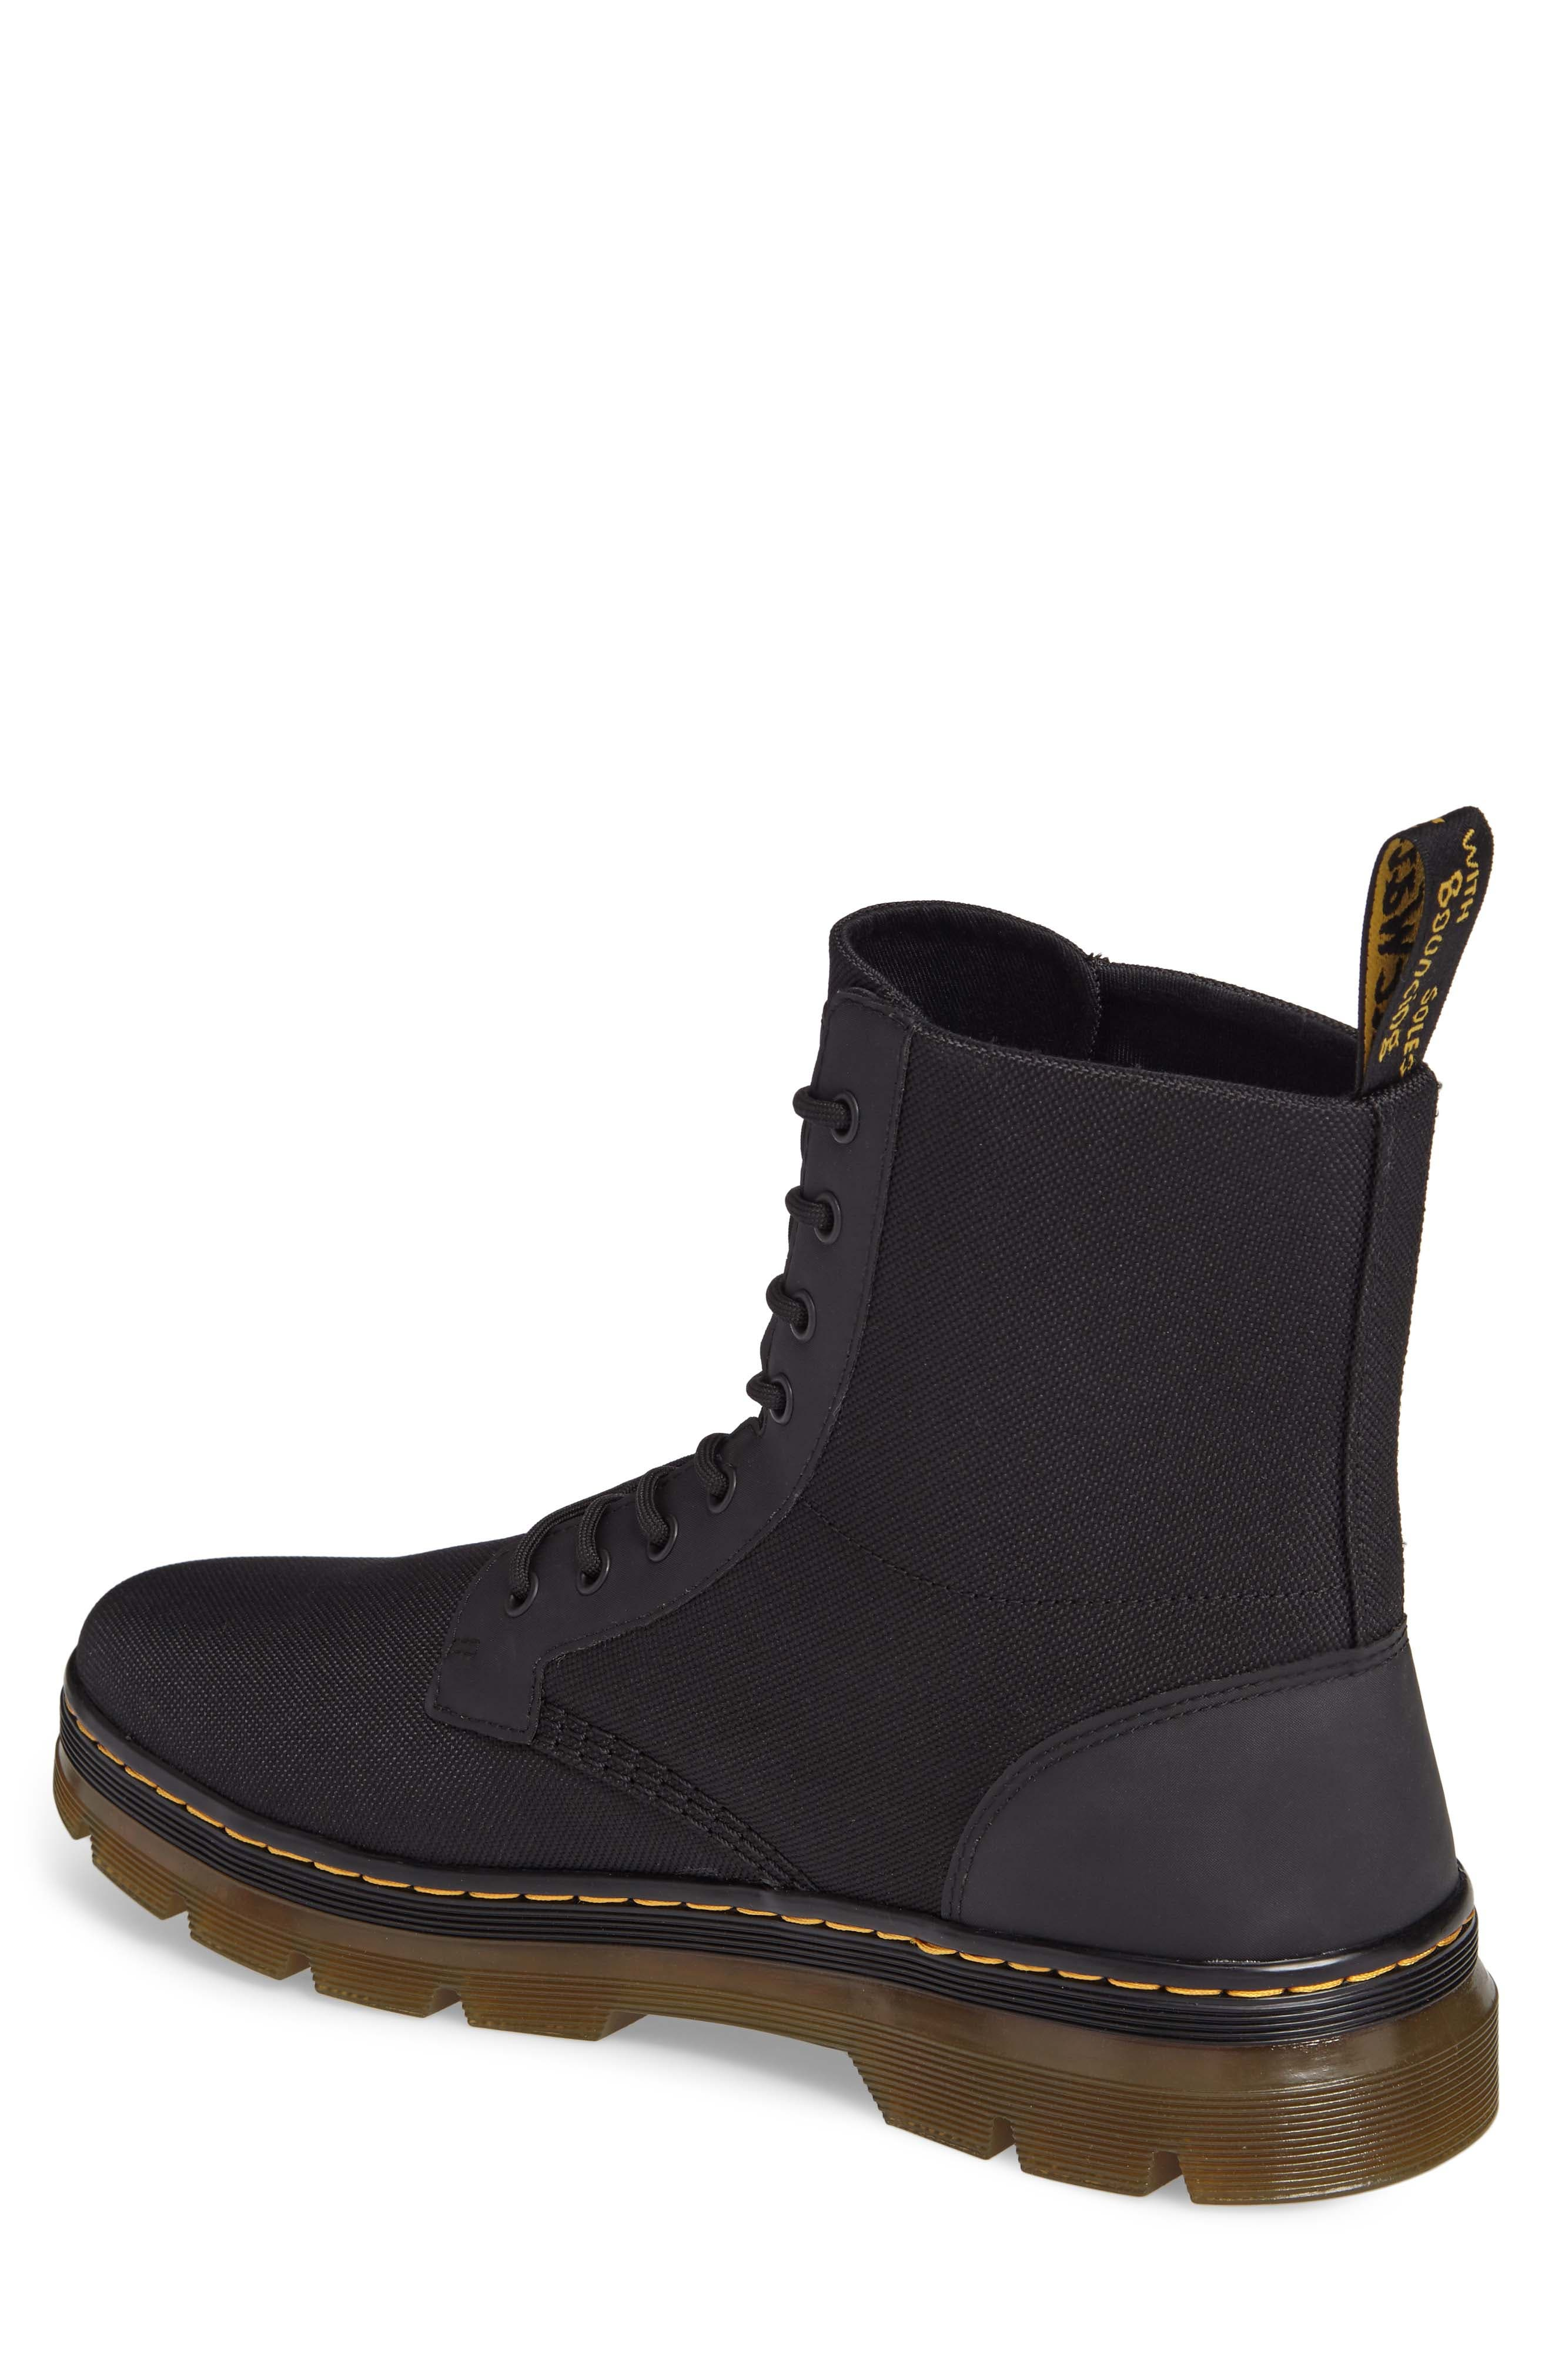 'Combs' Plain Toe Boot,                             Alternate thumbnail 2, color,                             001